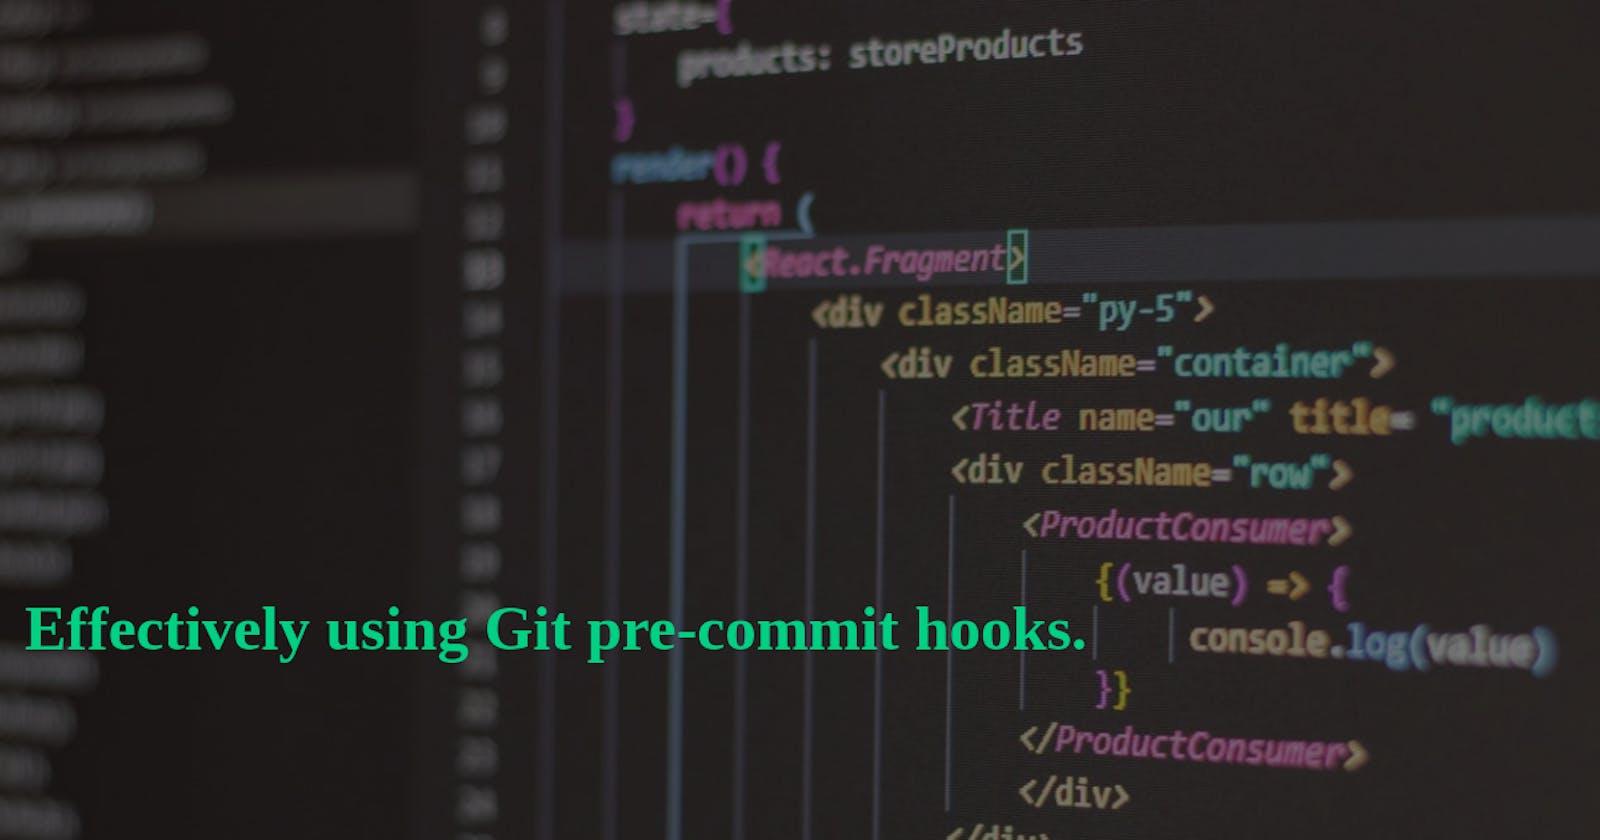 Effectively using Pre-commit hooks in Git for Javascript Developers.